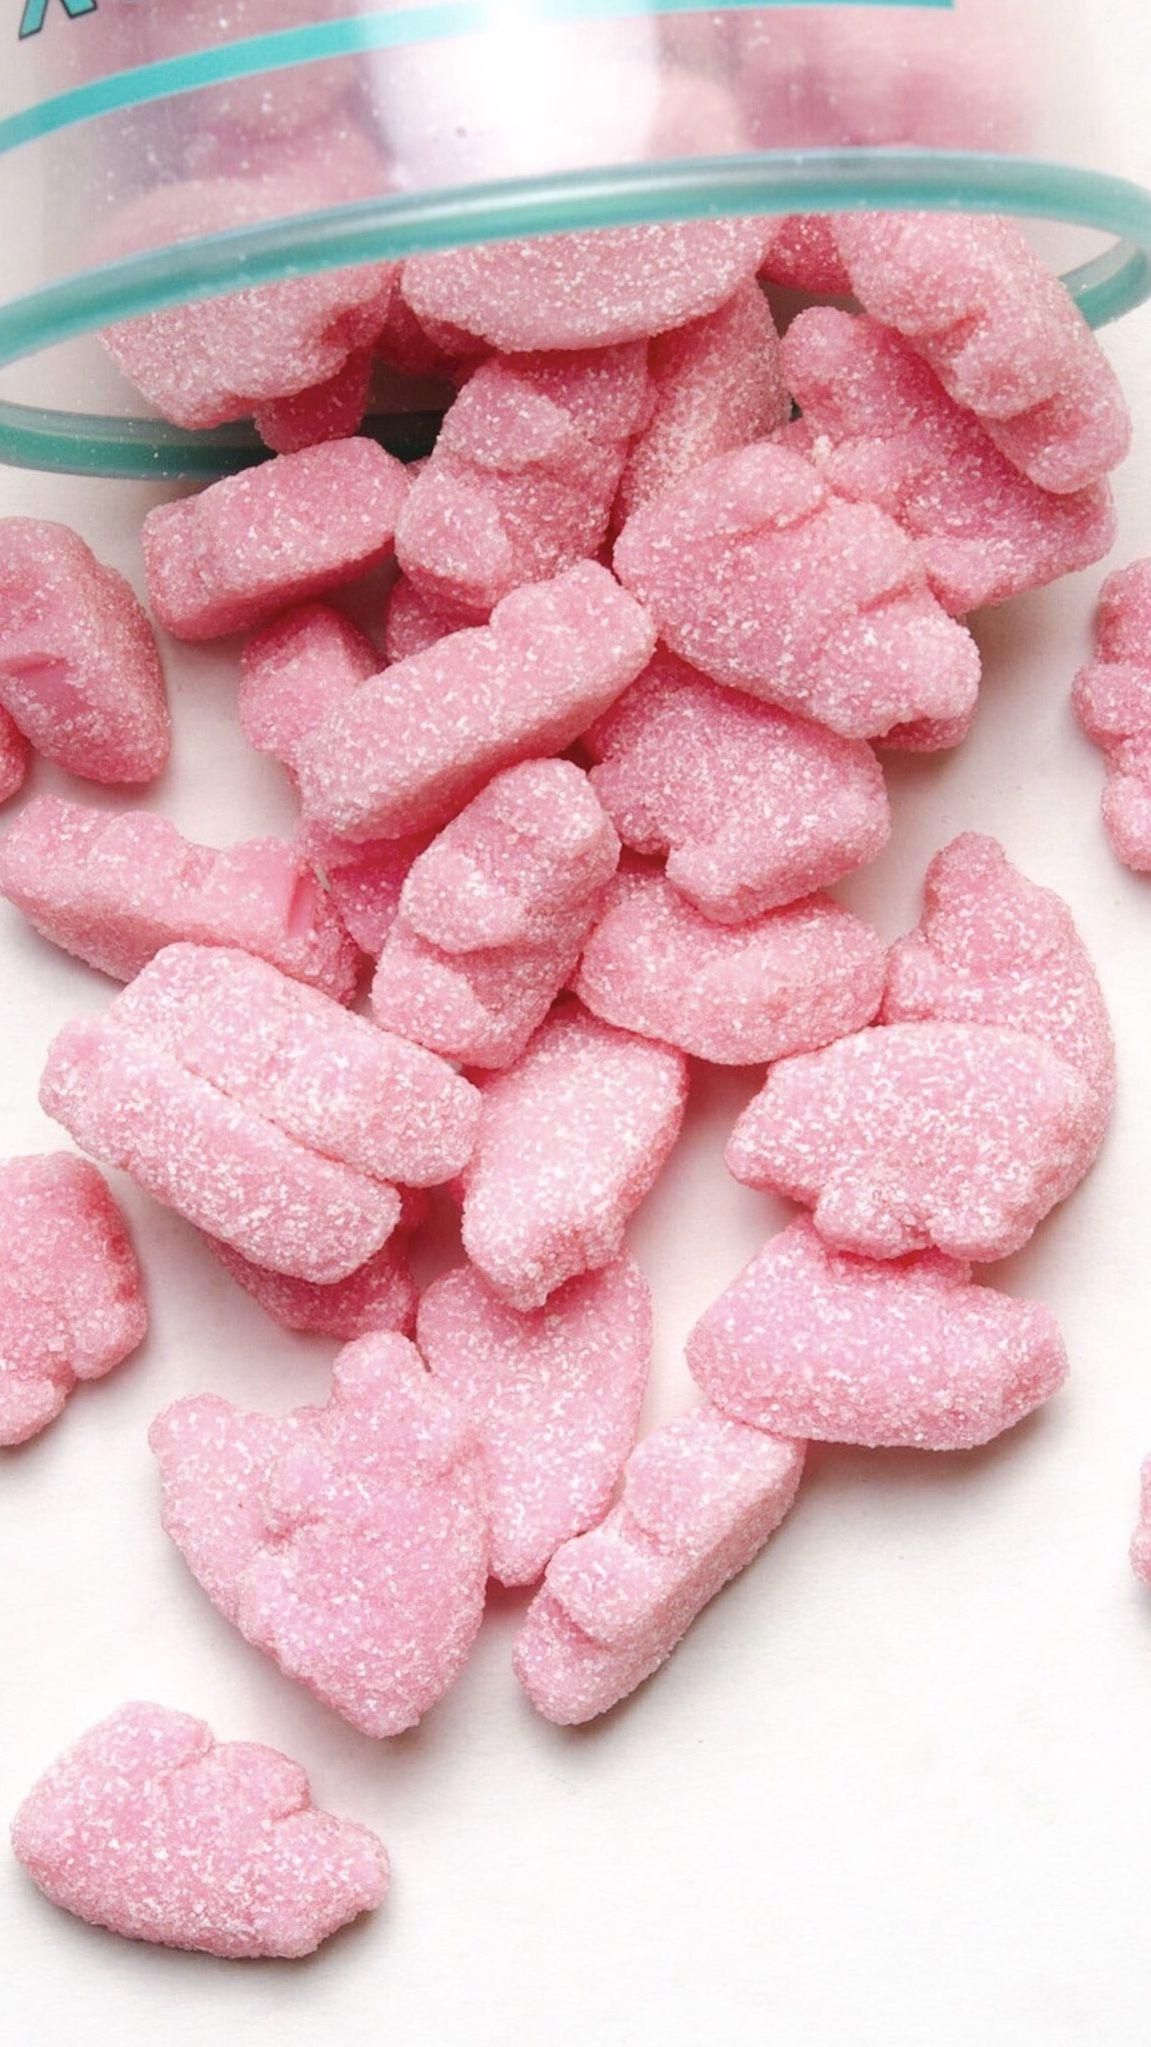 SOUR MINI GUMMY PIGLETS 🐷 Go ham on these adorable gummy